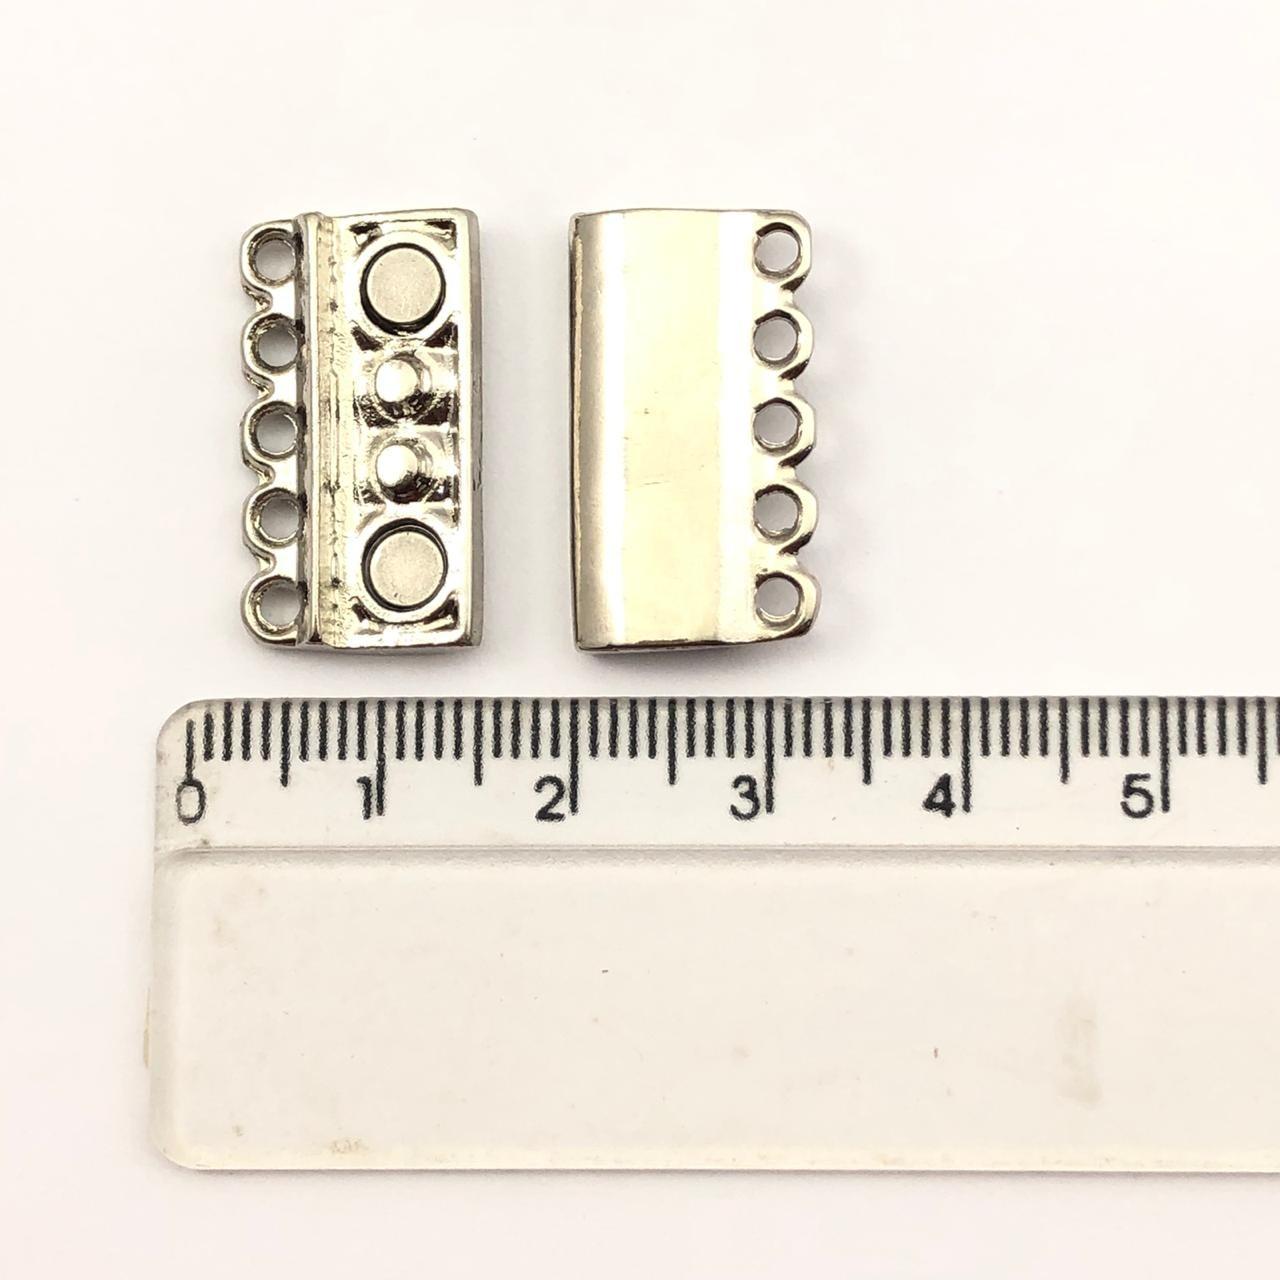 FC105 - Fecho Imã 5 Saídas Ródio Branco - 01Conjunto